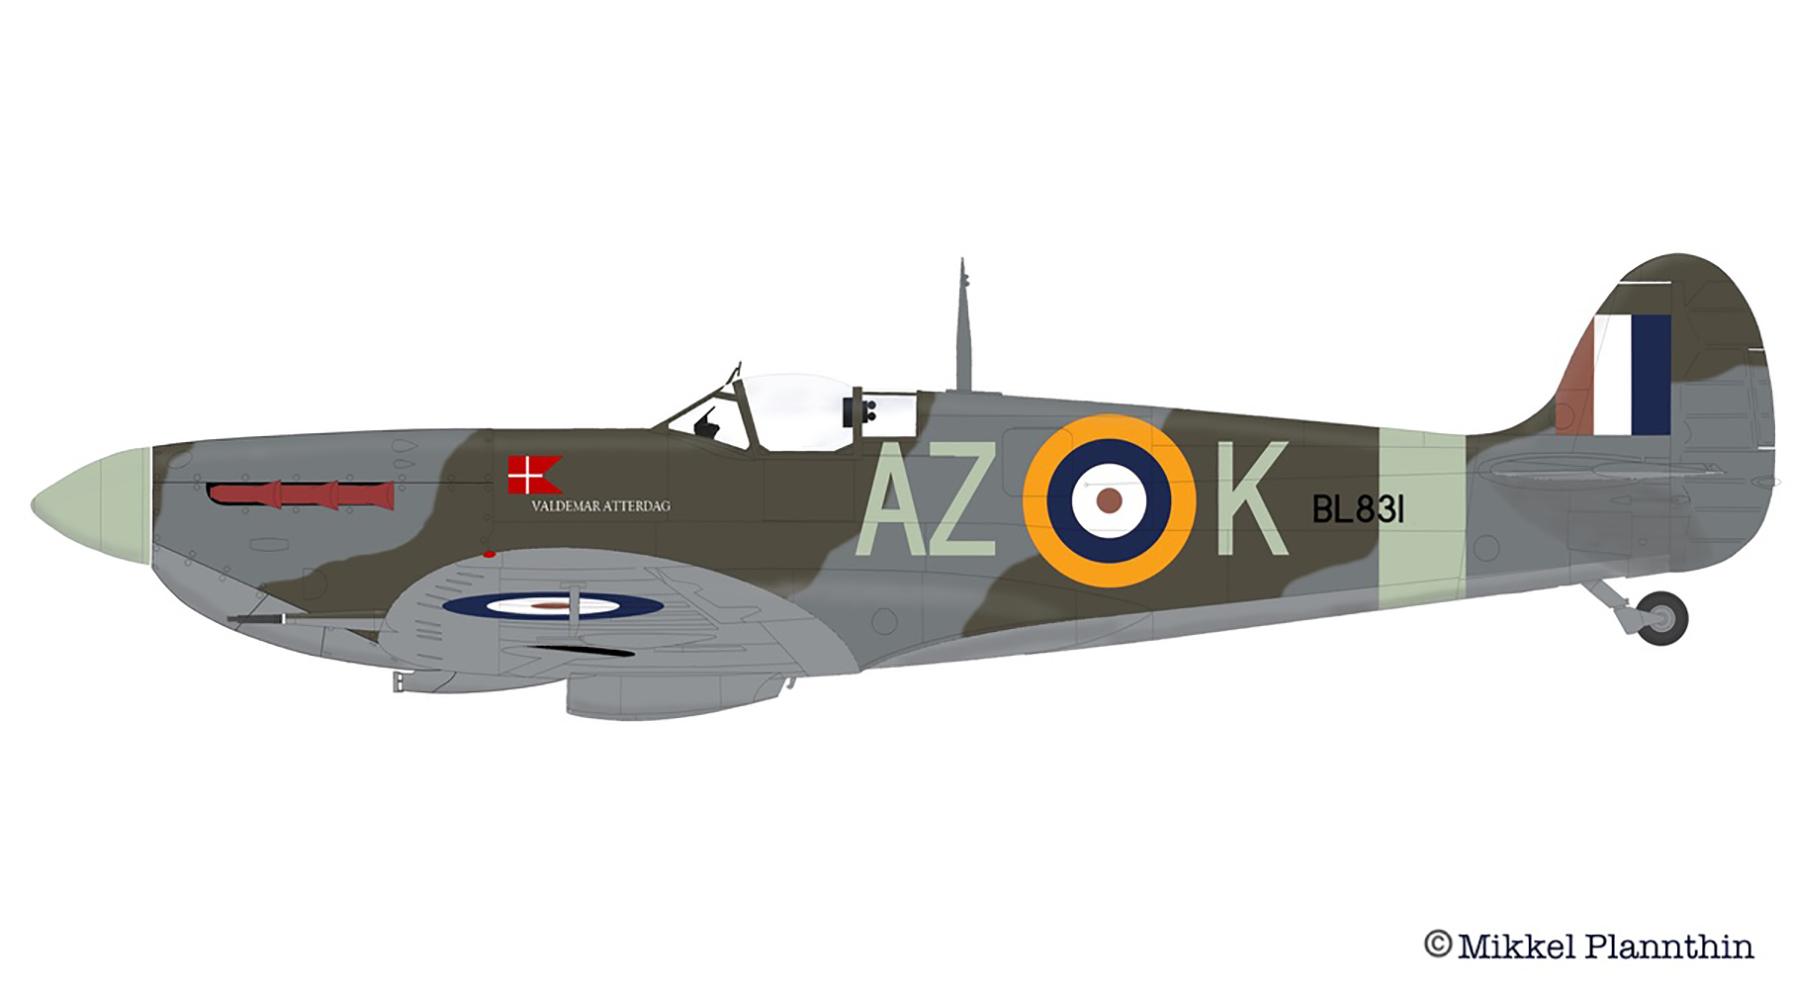 Spitfire MkVb RAF 234Sqn AZK named Valdemar Atterdag BL831 April 1942 by Mikkel Plannthin 0A